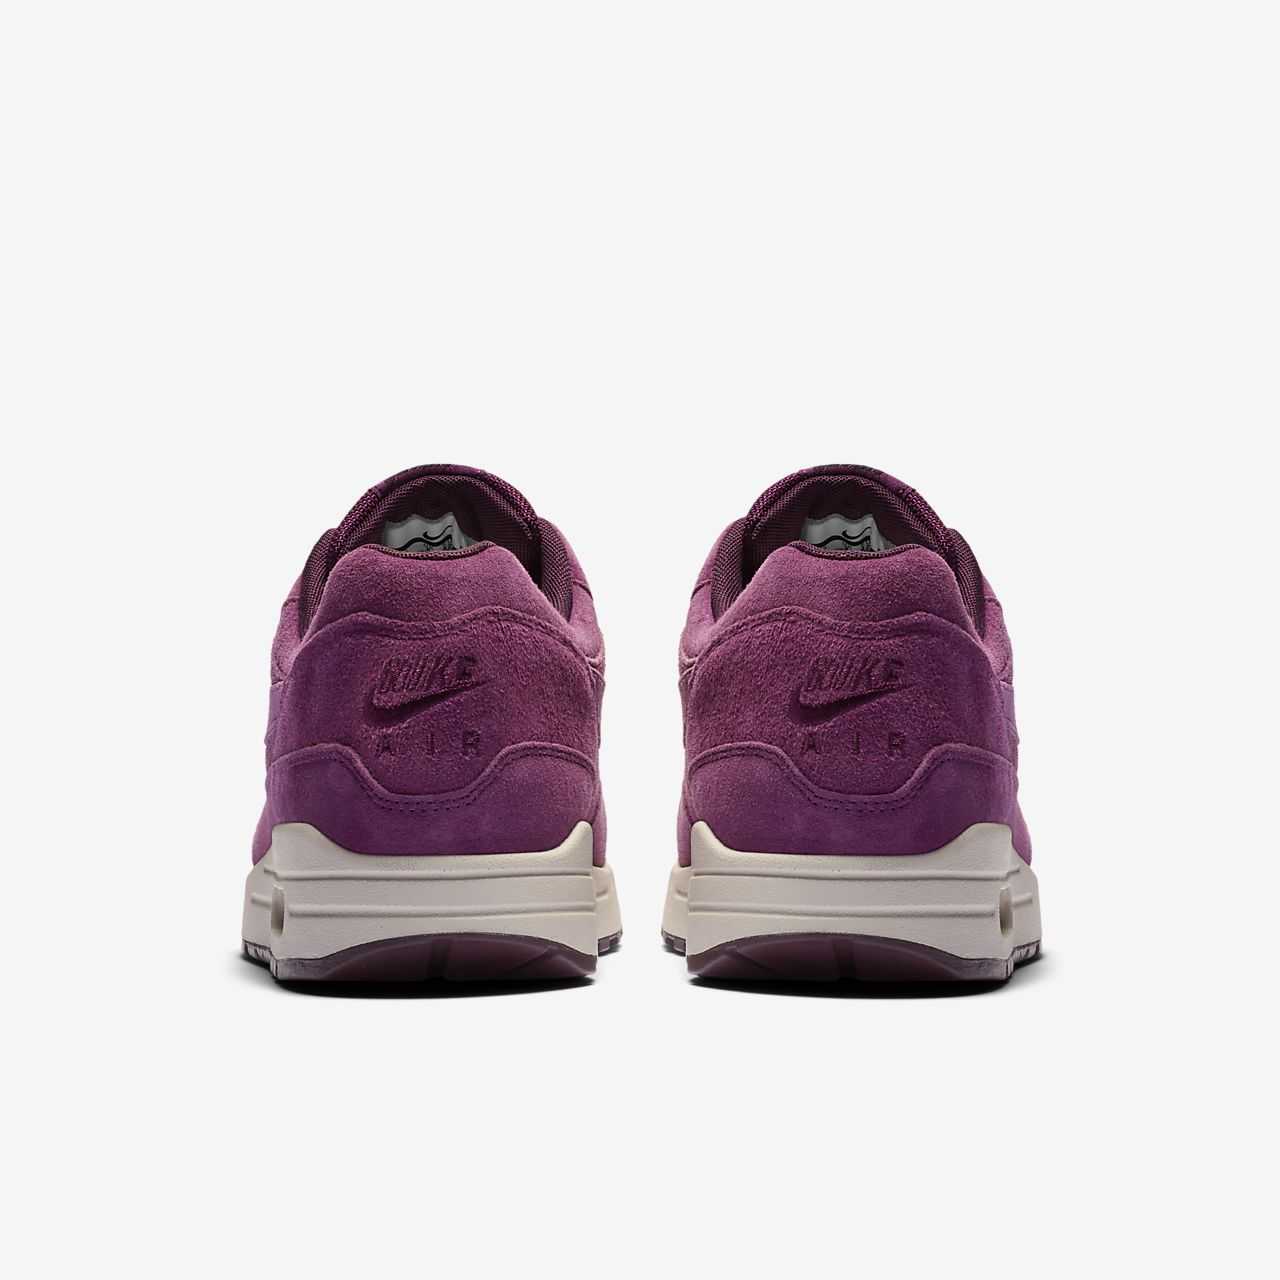 pretty nice 78907 e3322 ... Nike Air Max 1 Premium Men s Shoe